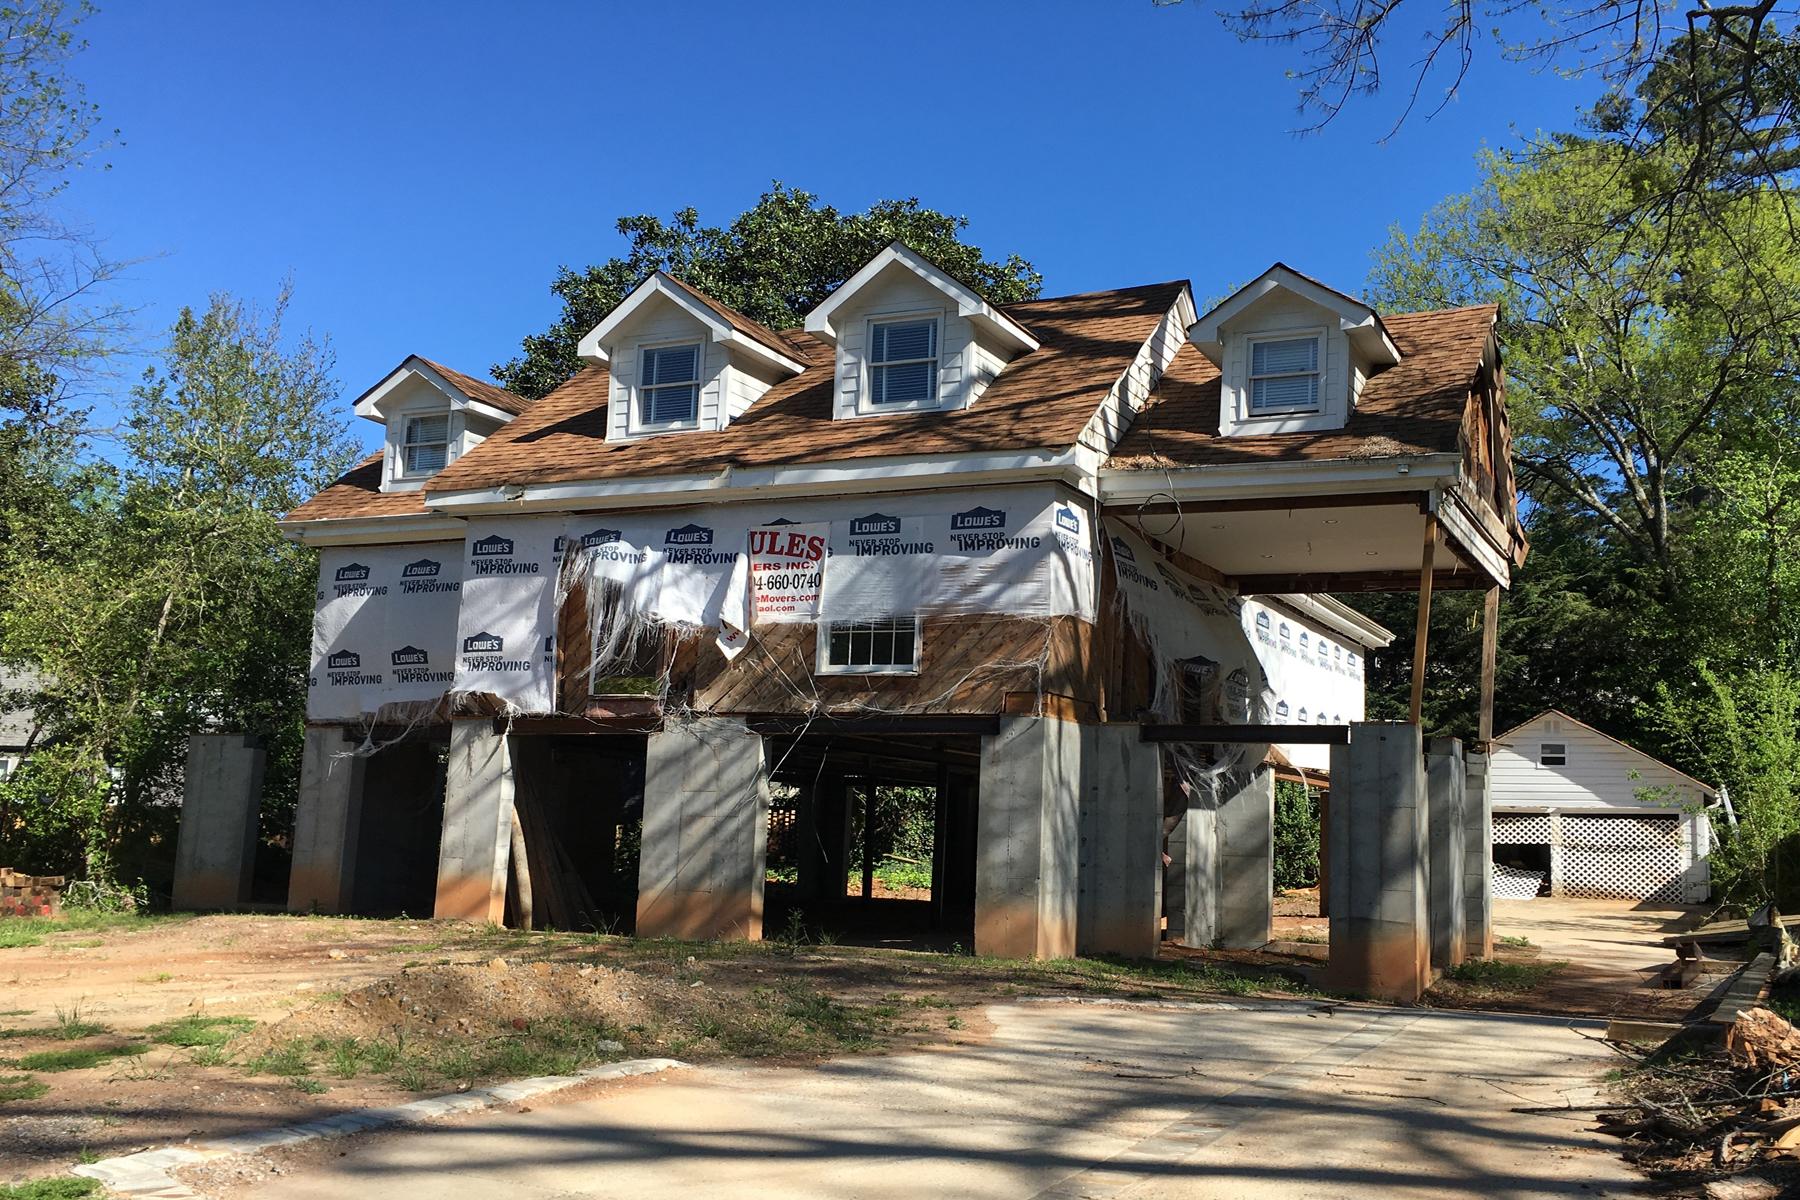 Villa per Vendita alle ore New Construction Buckhead Homesite 559 Woodward Way NW Haynes Manor, Atlanta, Georgia, 30305 Stati Uniti